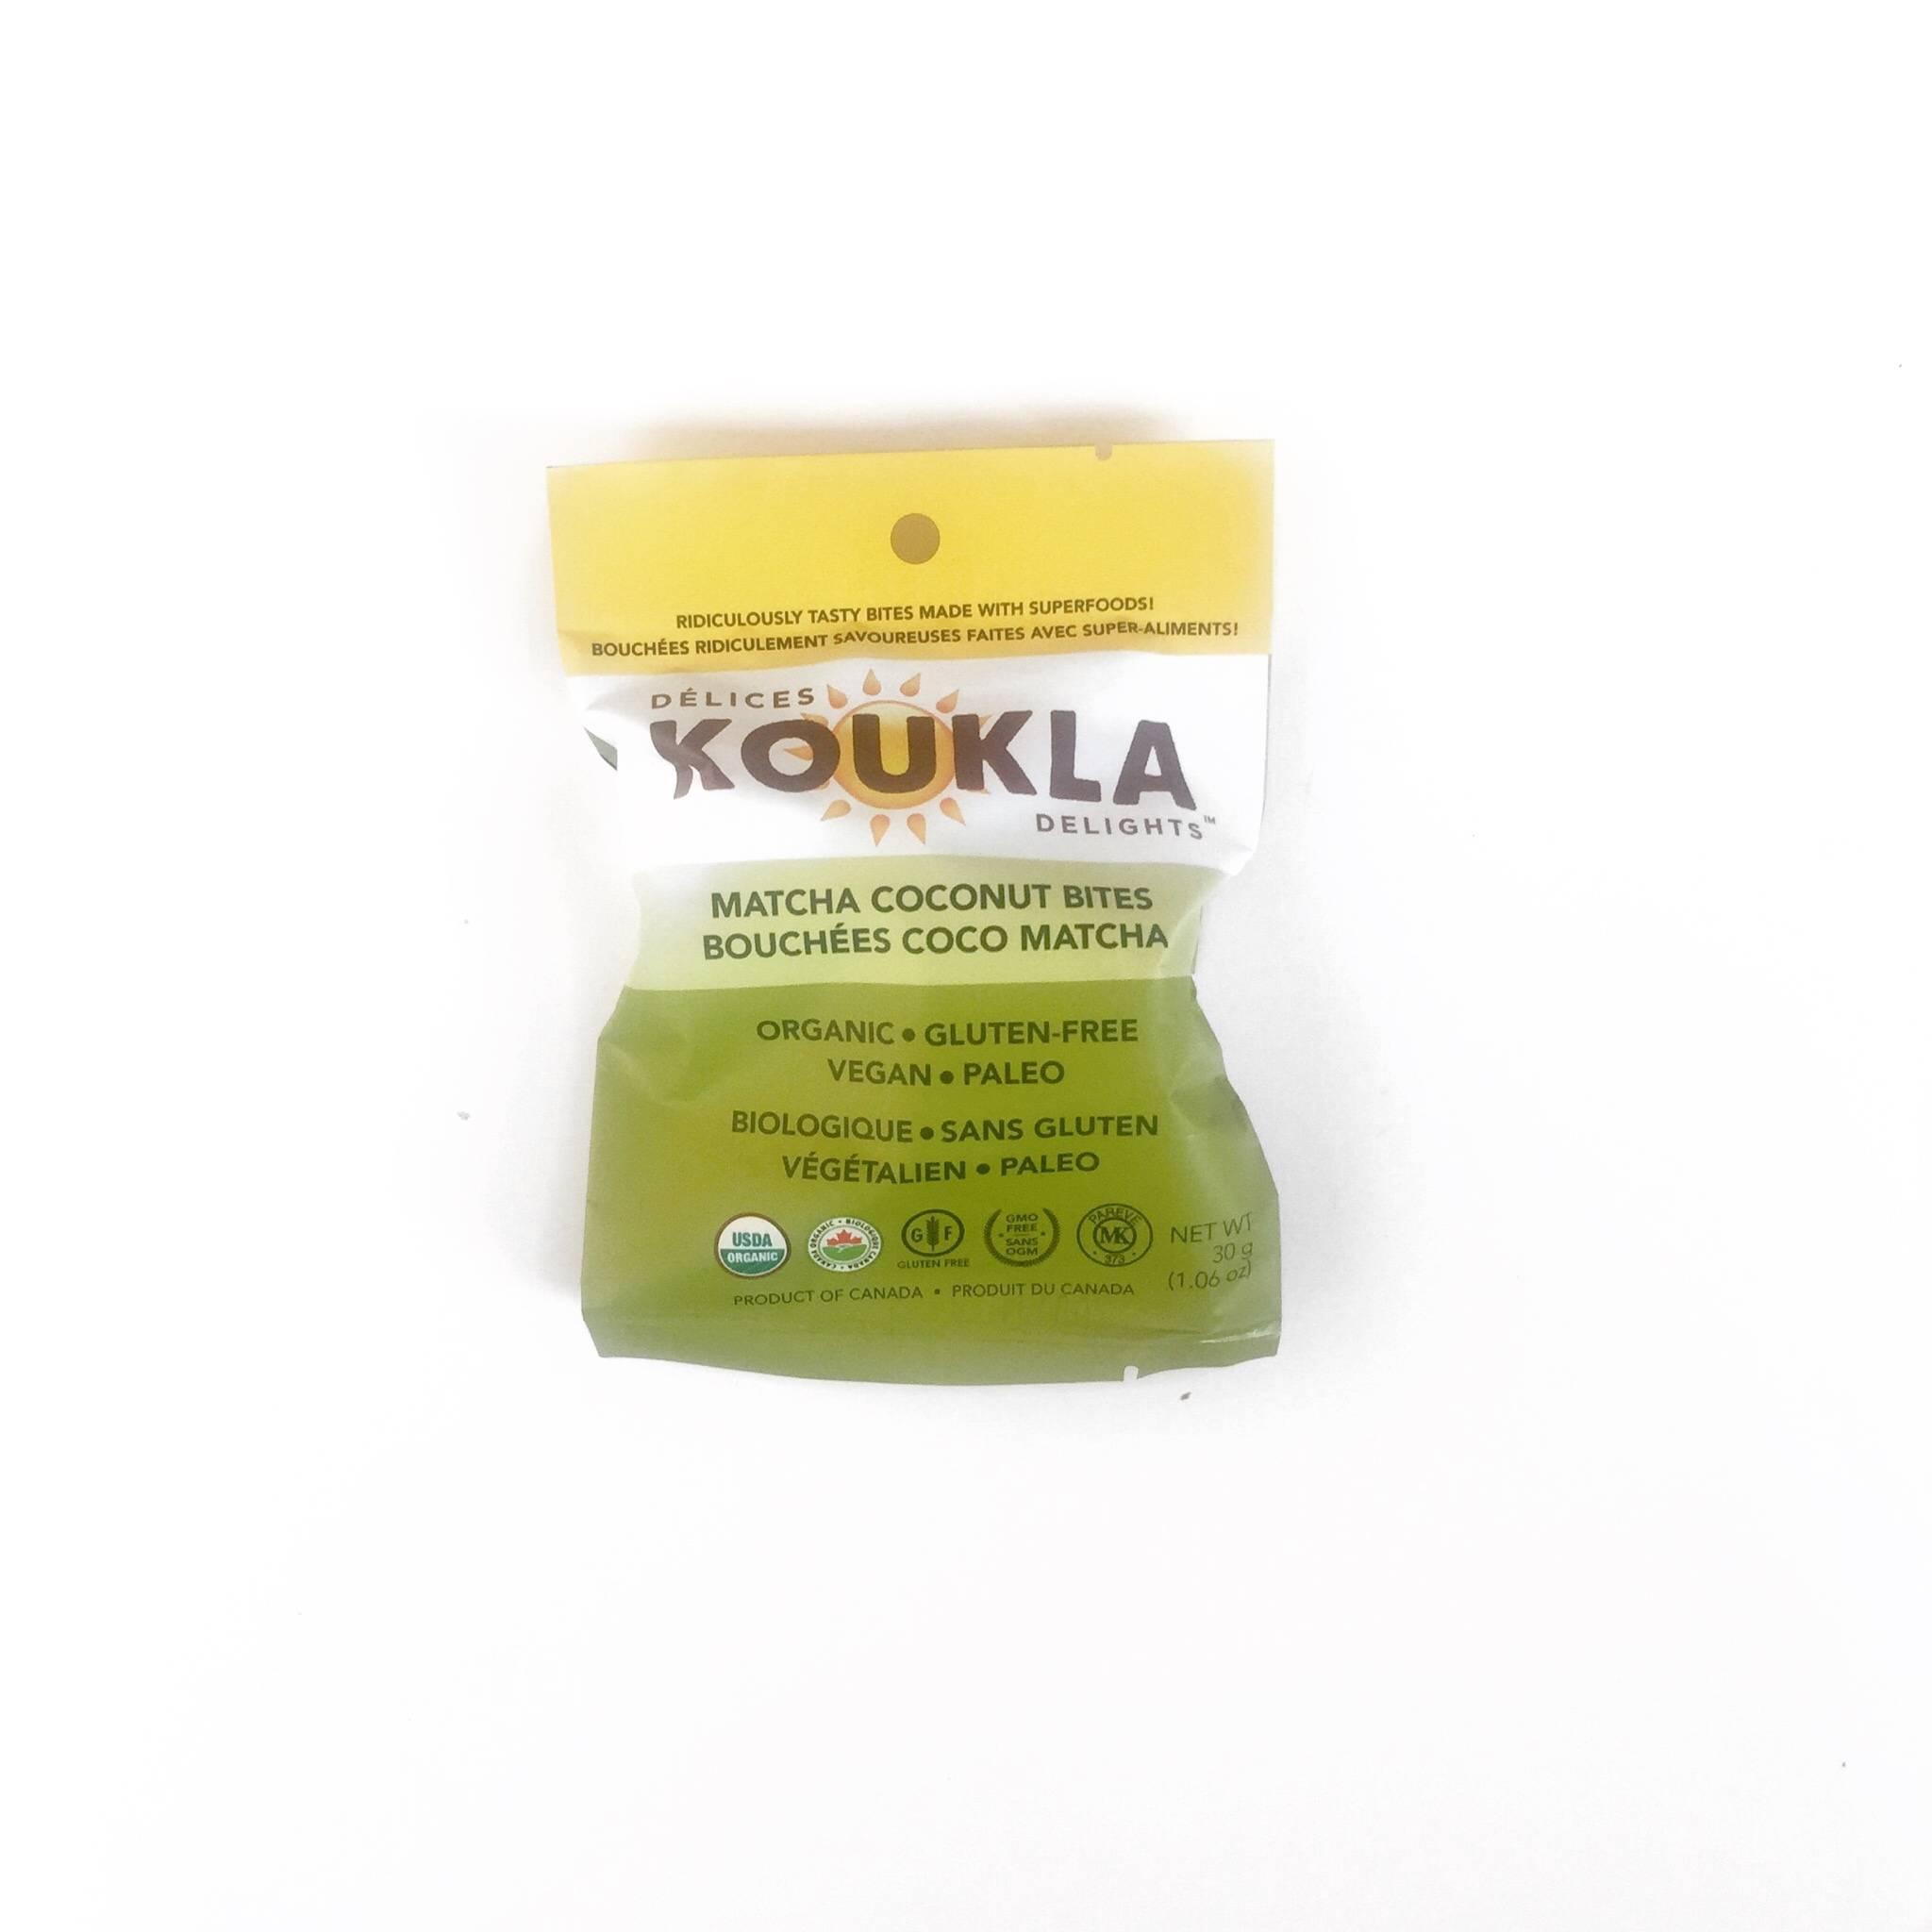 koukla delights delices bouchees coco matcha